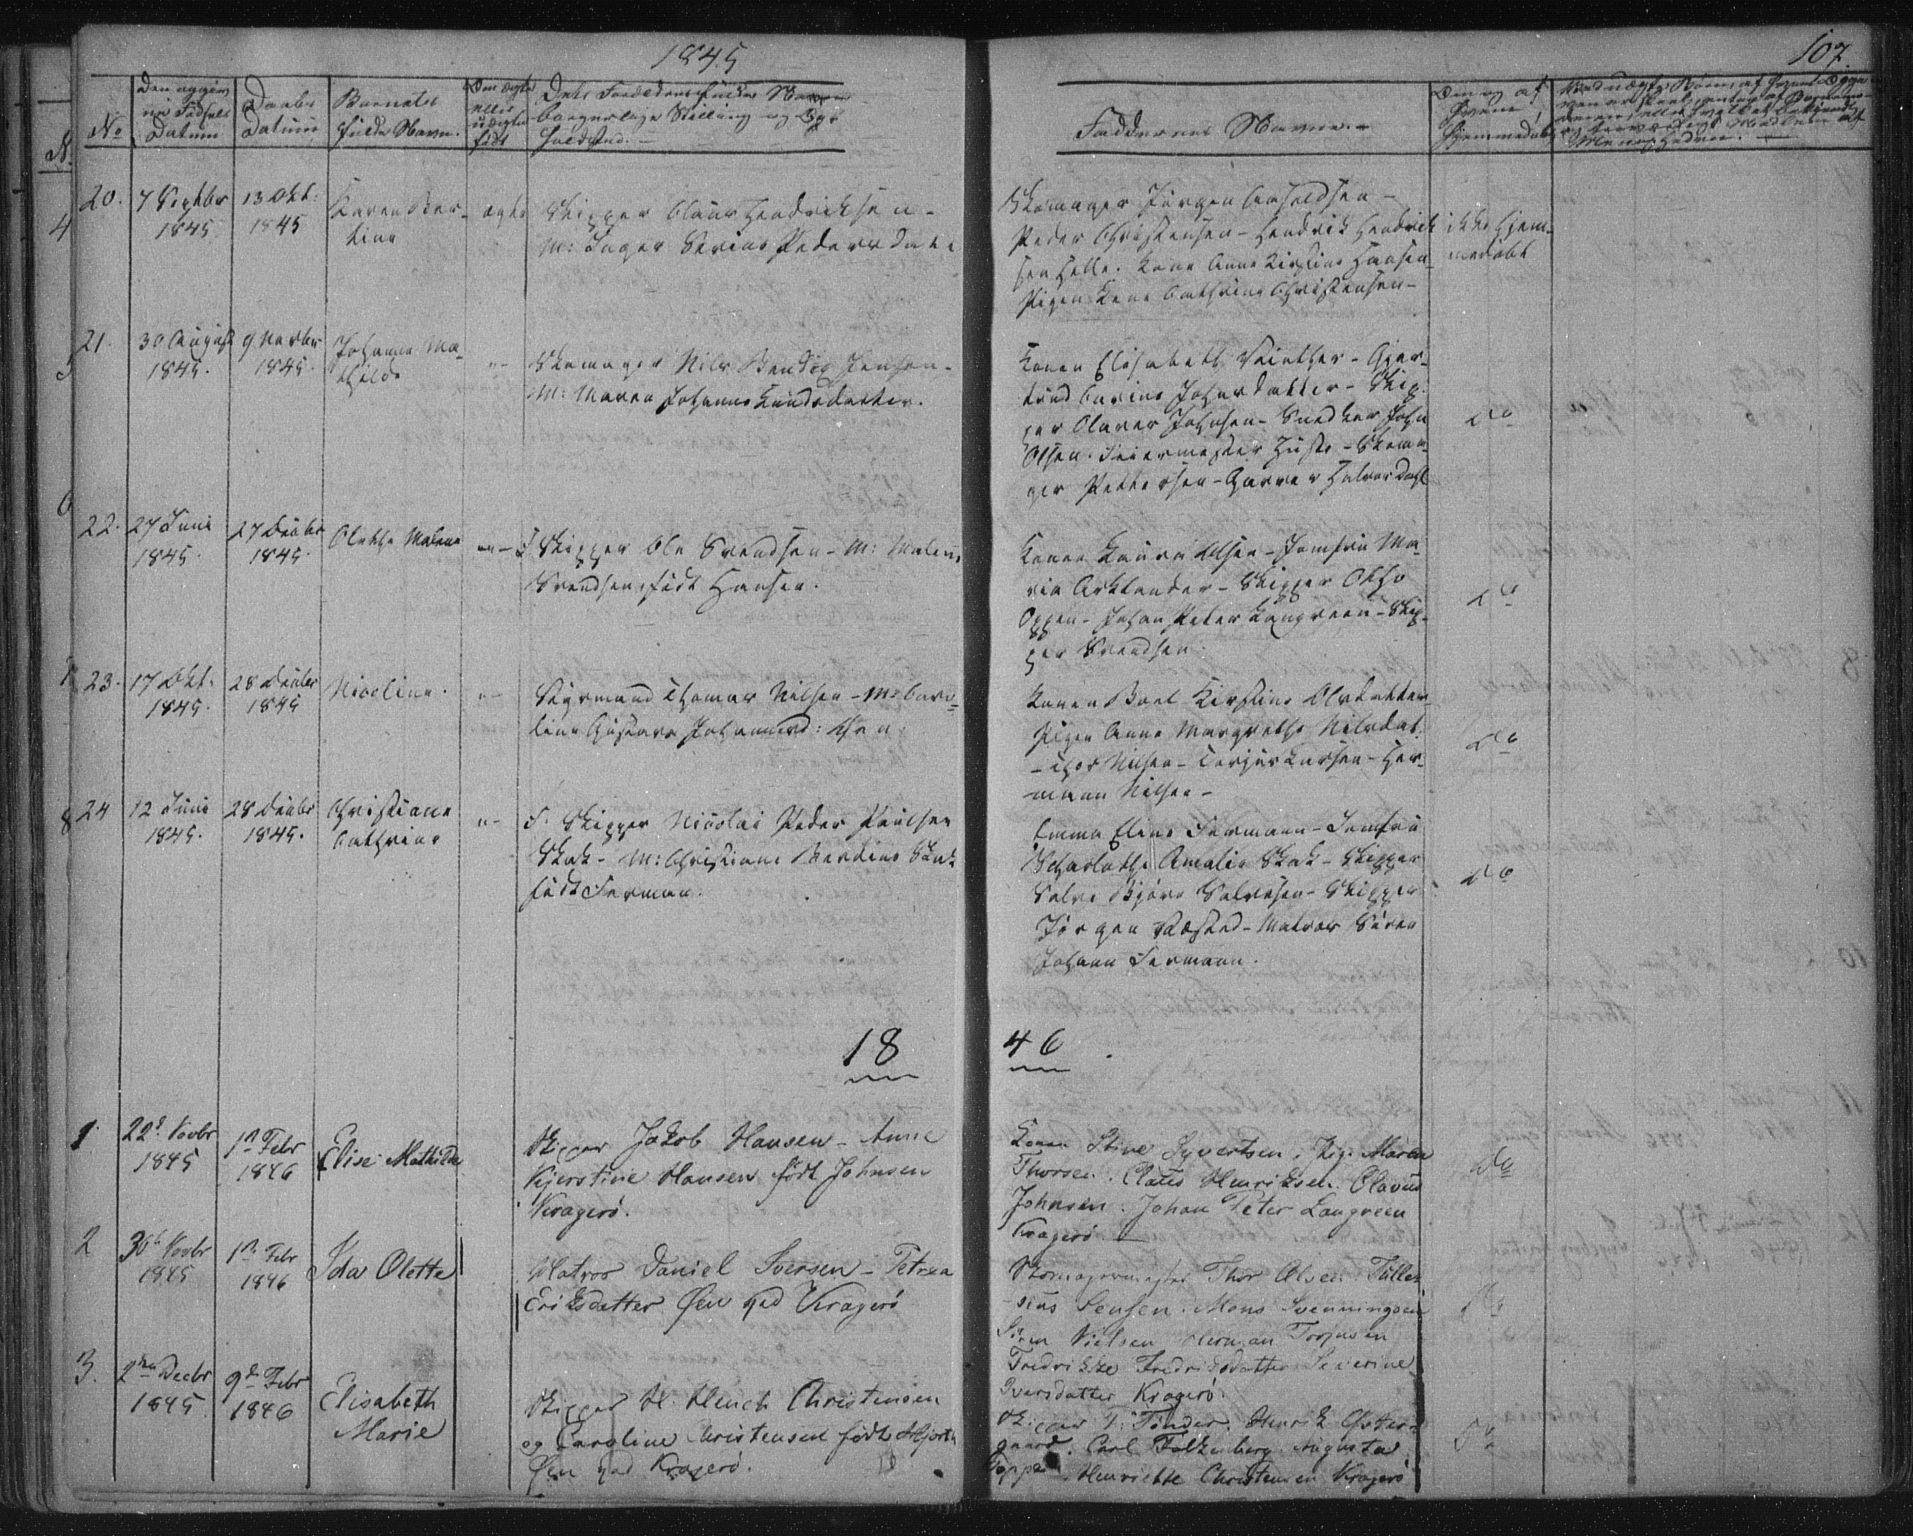 SAKO, Kragerø kirkebøker, F/Fa/L0005: Ministerialbok nr. 5, 1832-1847, s. 107